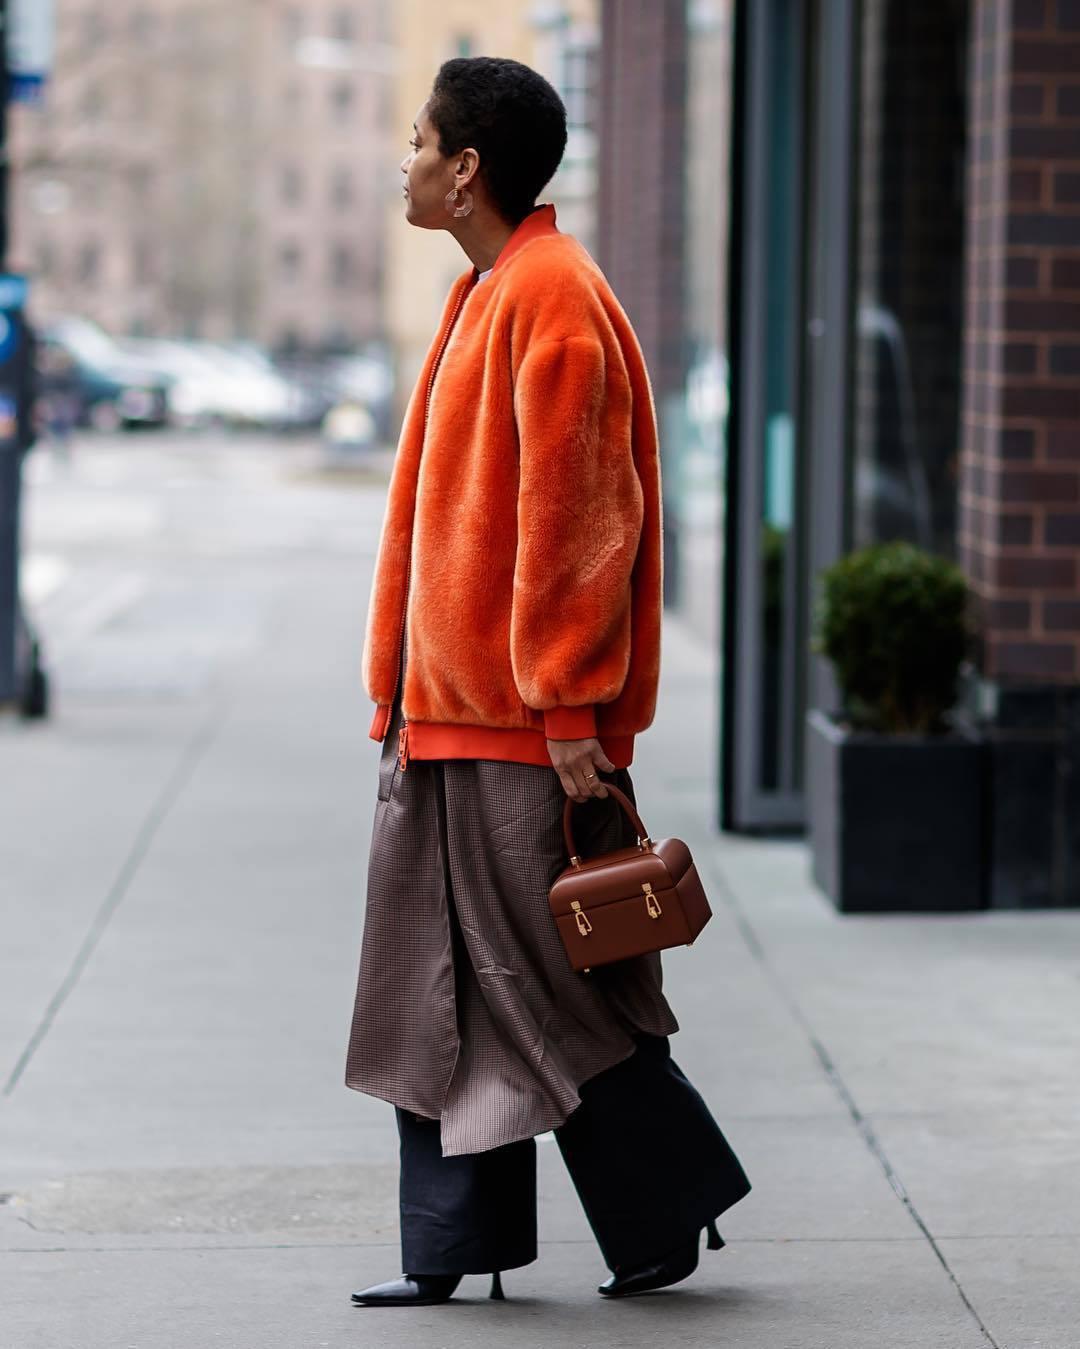 jacket orange jackt faux fur jacket wide-leg pants black pants black boots heel boots kimono handbag brown bag boxed bag